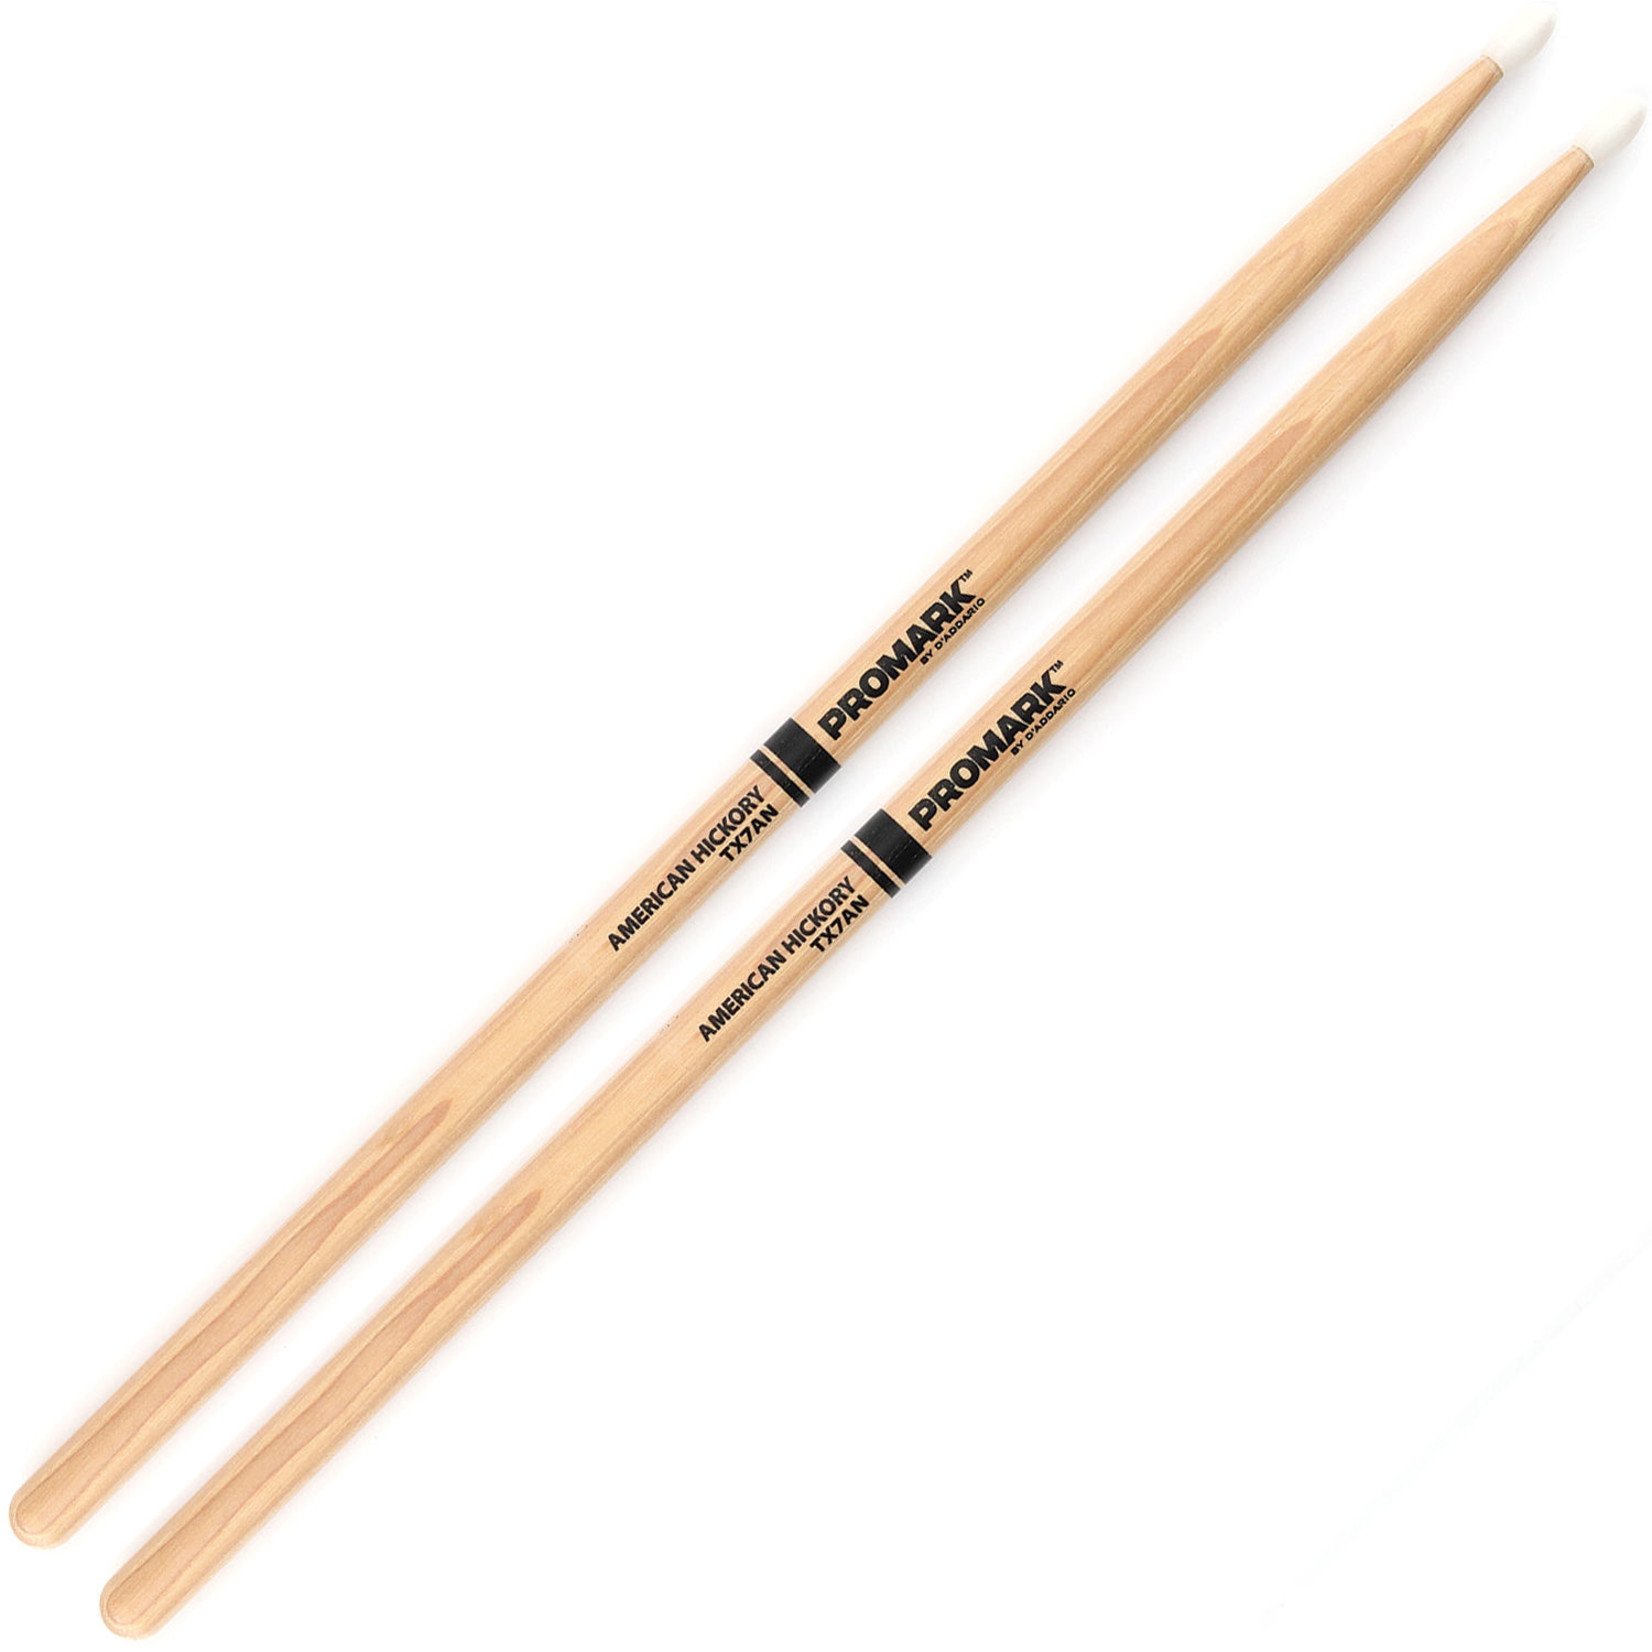 Promark ProMark Classic Forward 7A Nylon Tip Drumstick